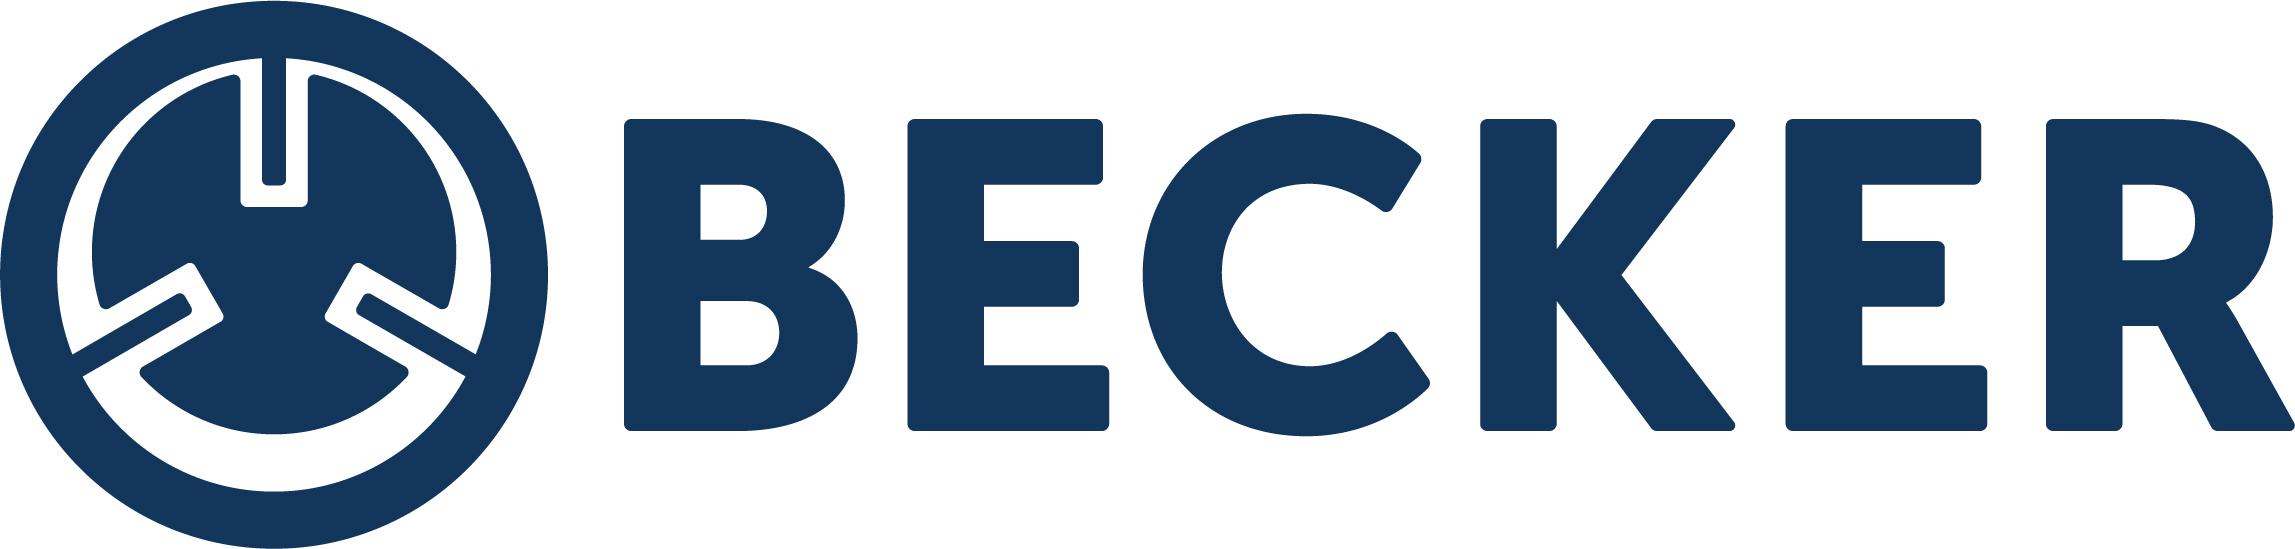 Becker logo rgb